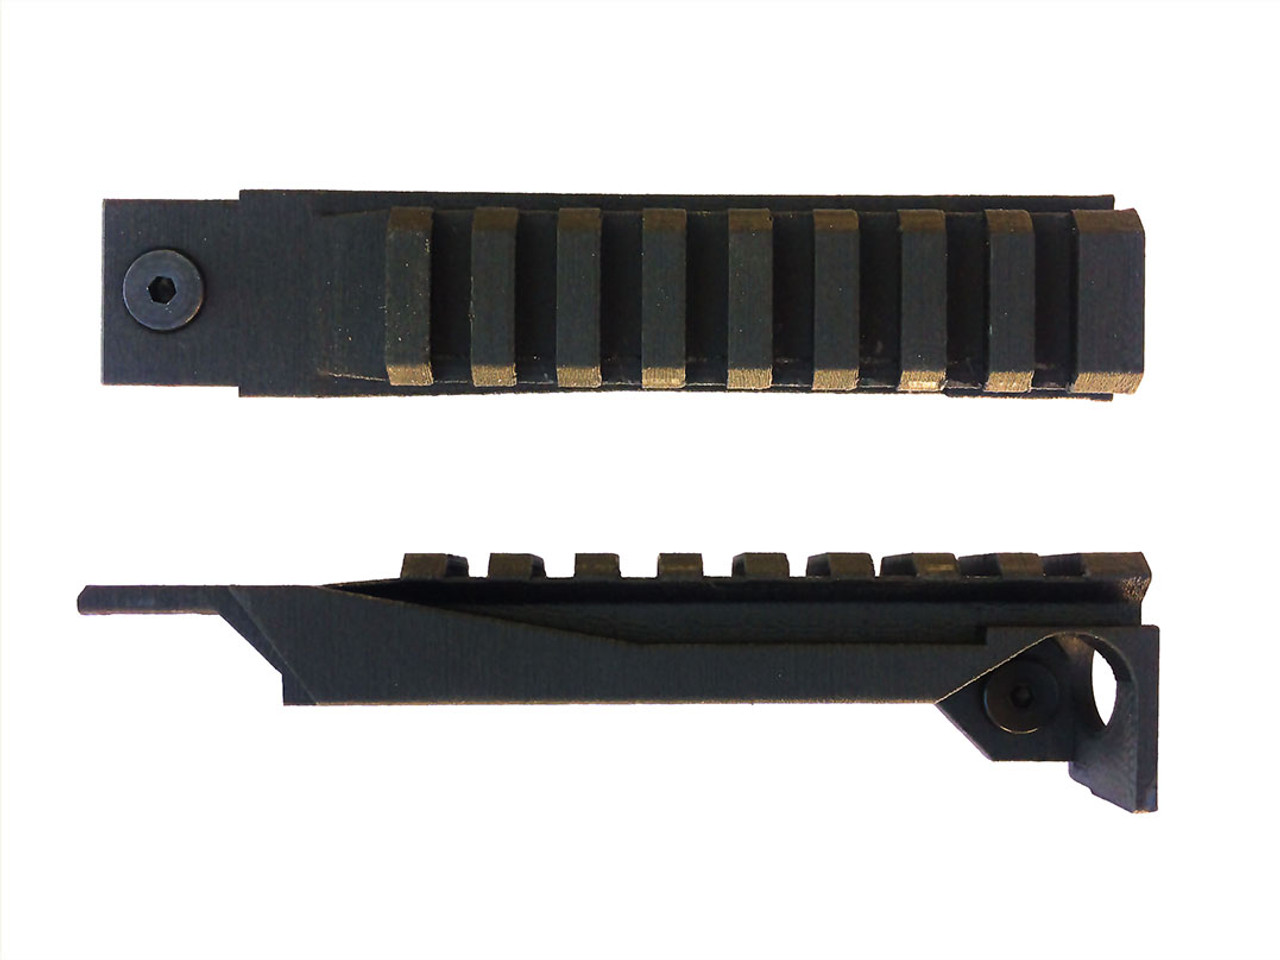 Ps90 low profile ultralight picatinny optic rail.